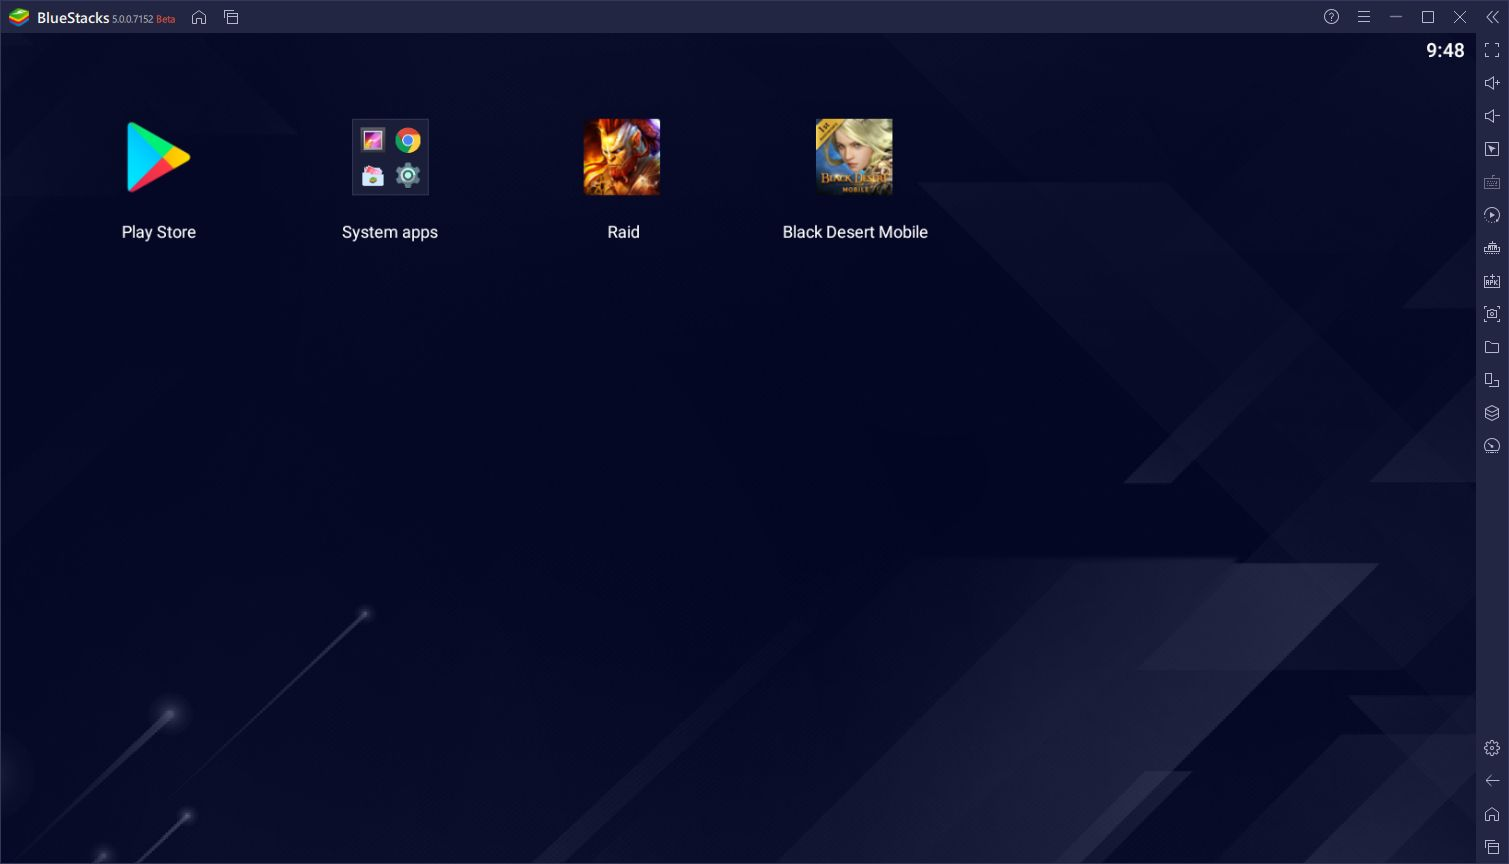 BlueStacks 5 interface utilisateur